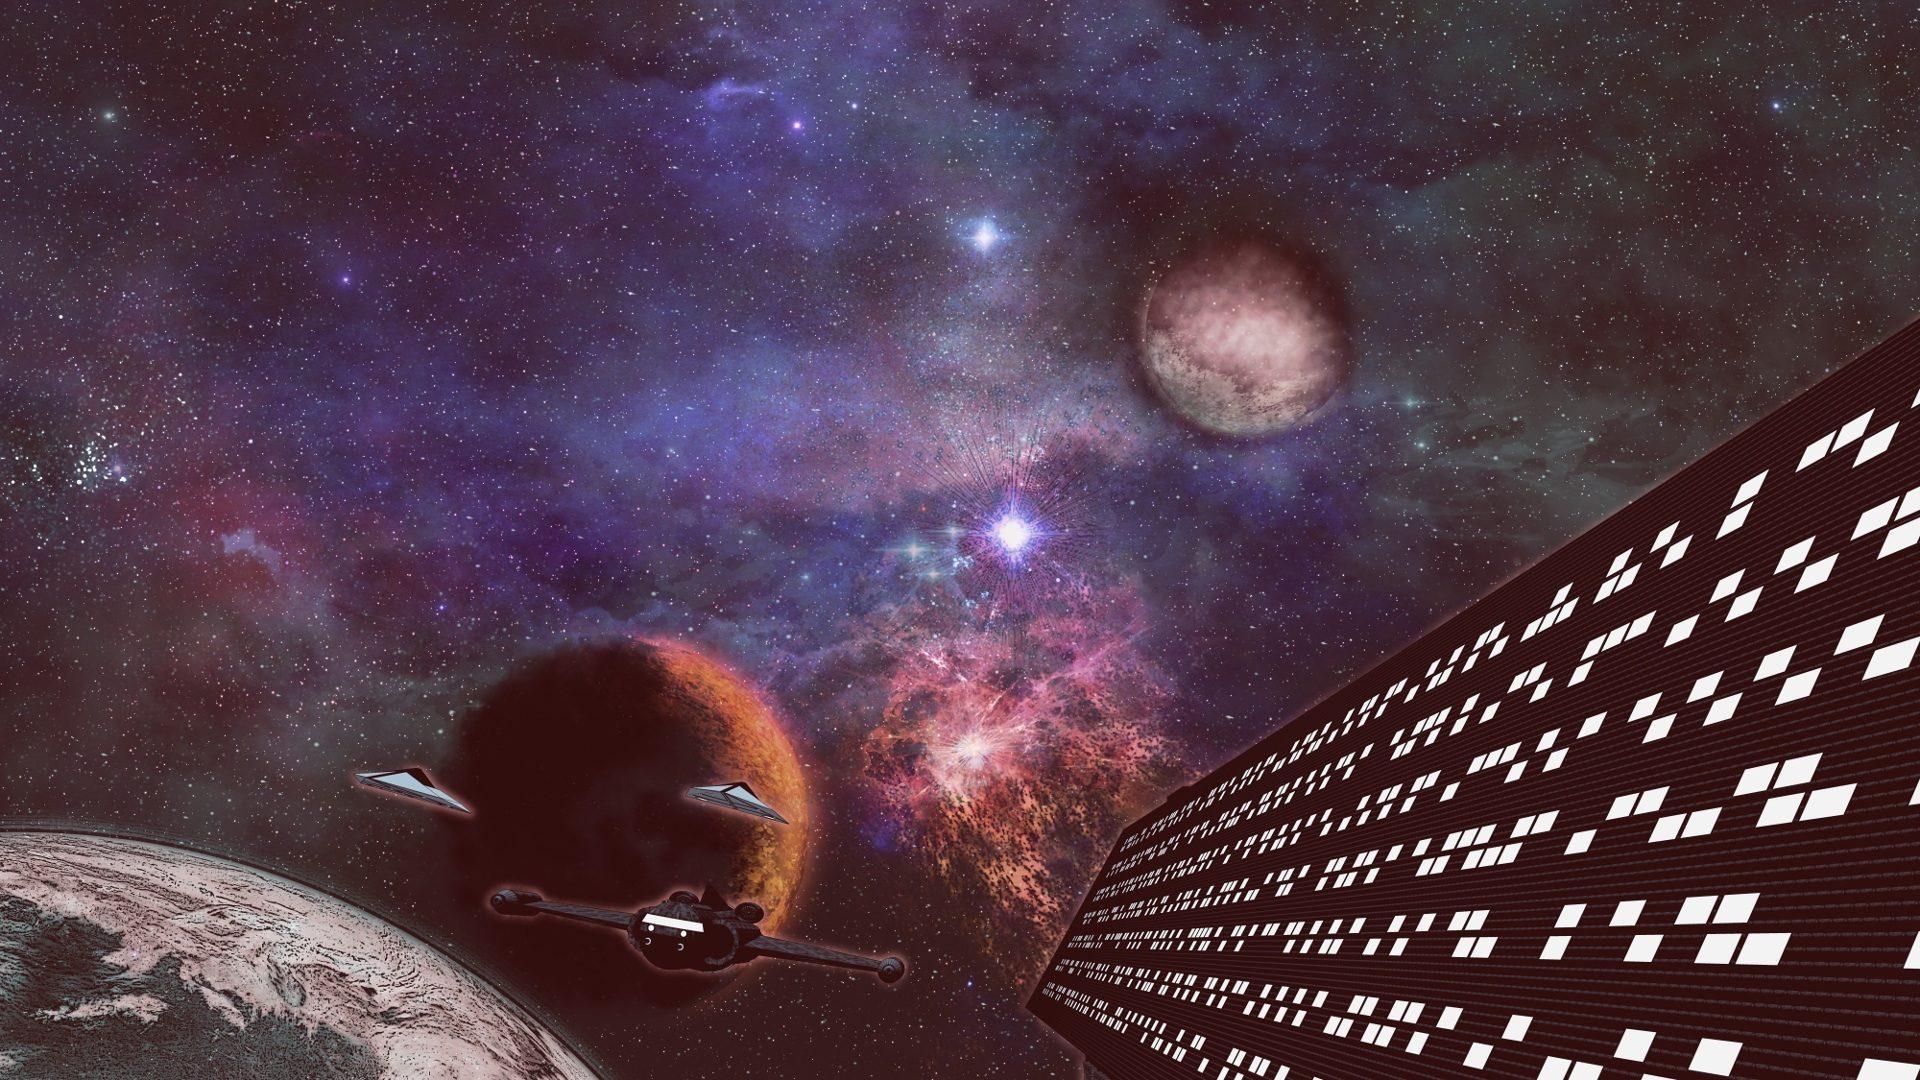 Papel De Parede Dos Planetas Estrela Naves Alien Alien Genas  -> Imagens Do Universo Para Papel De Parede